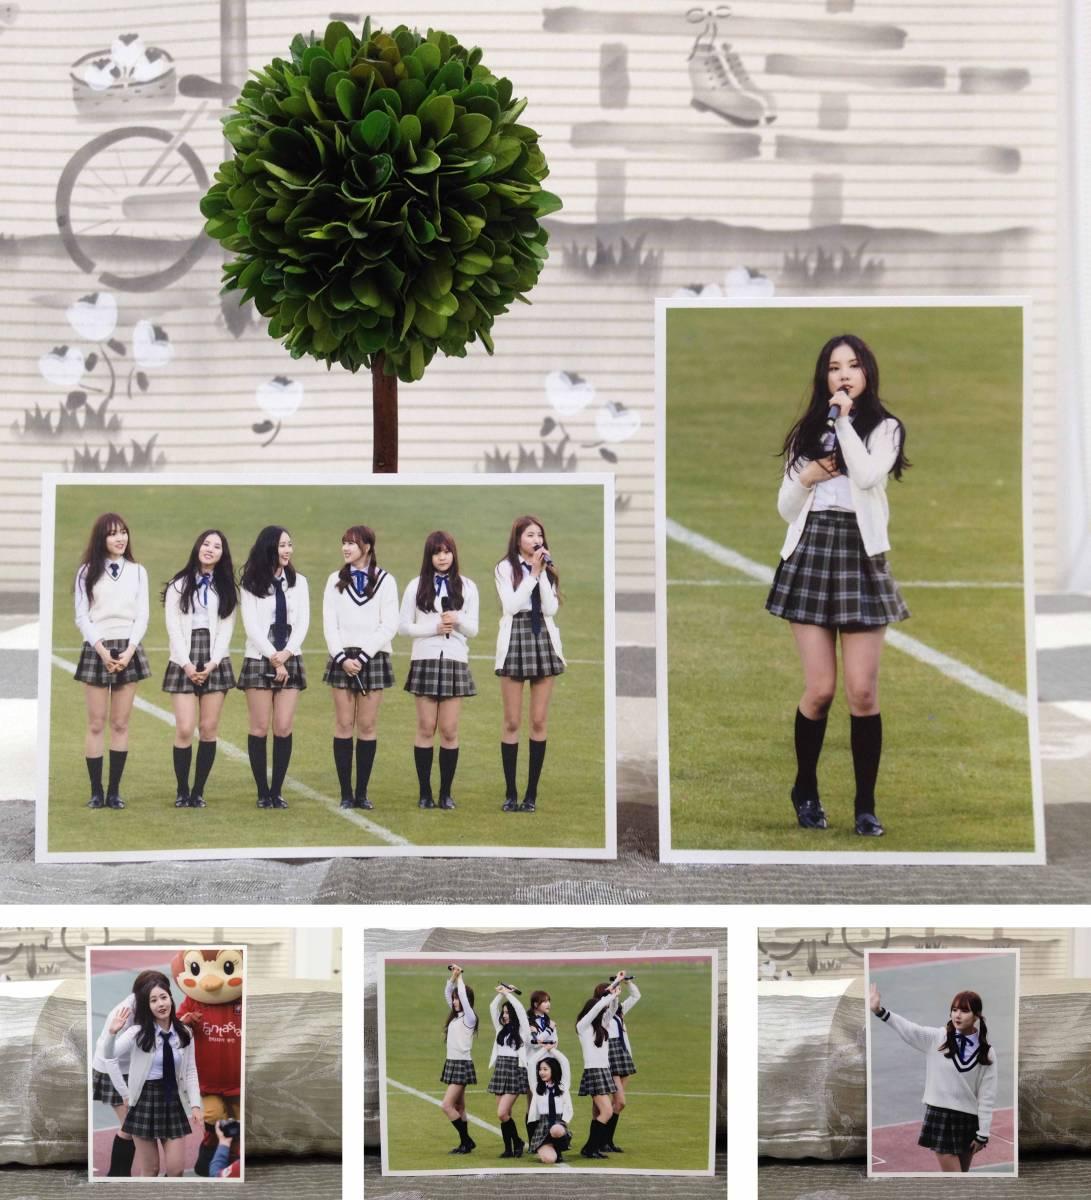 GFRIEND★ヨジャチング★2016.4月 K-League開幕戦 お祝舞台★FC生写真30枚